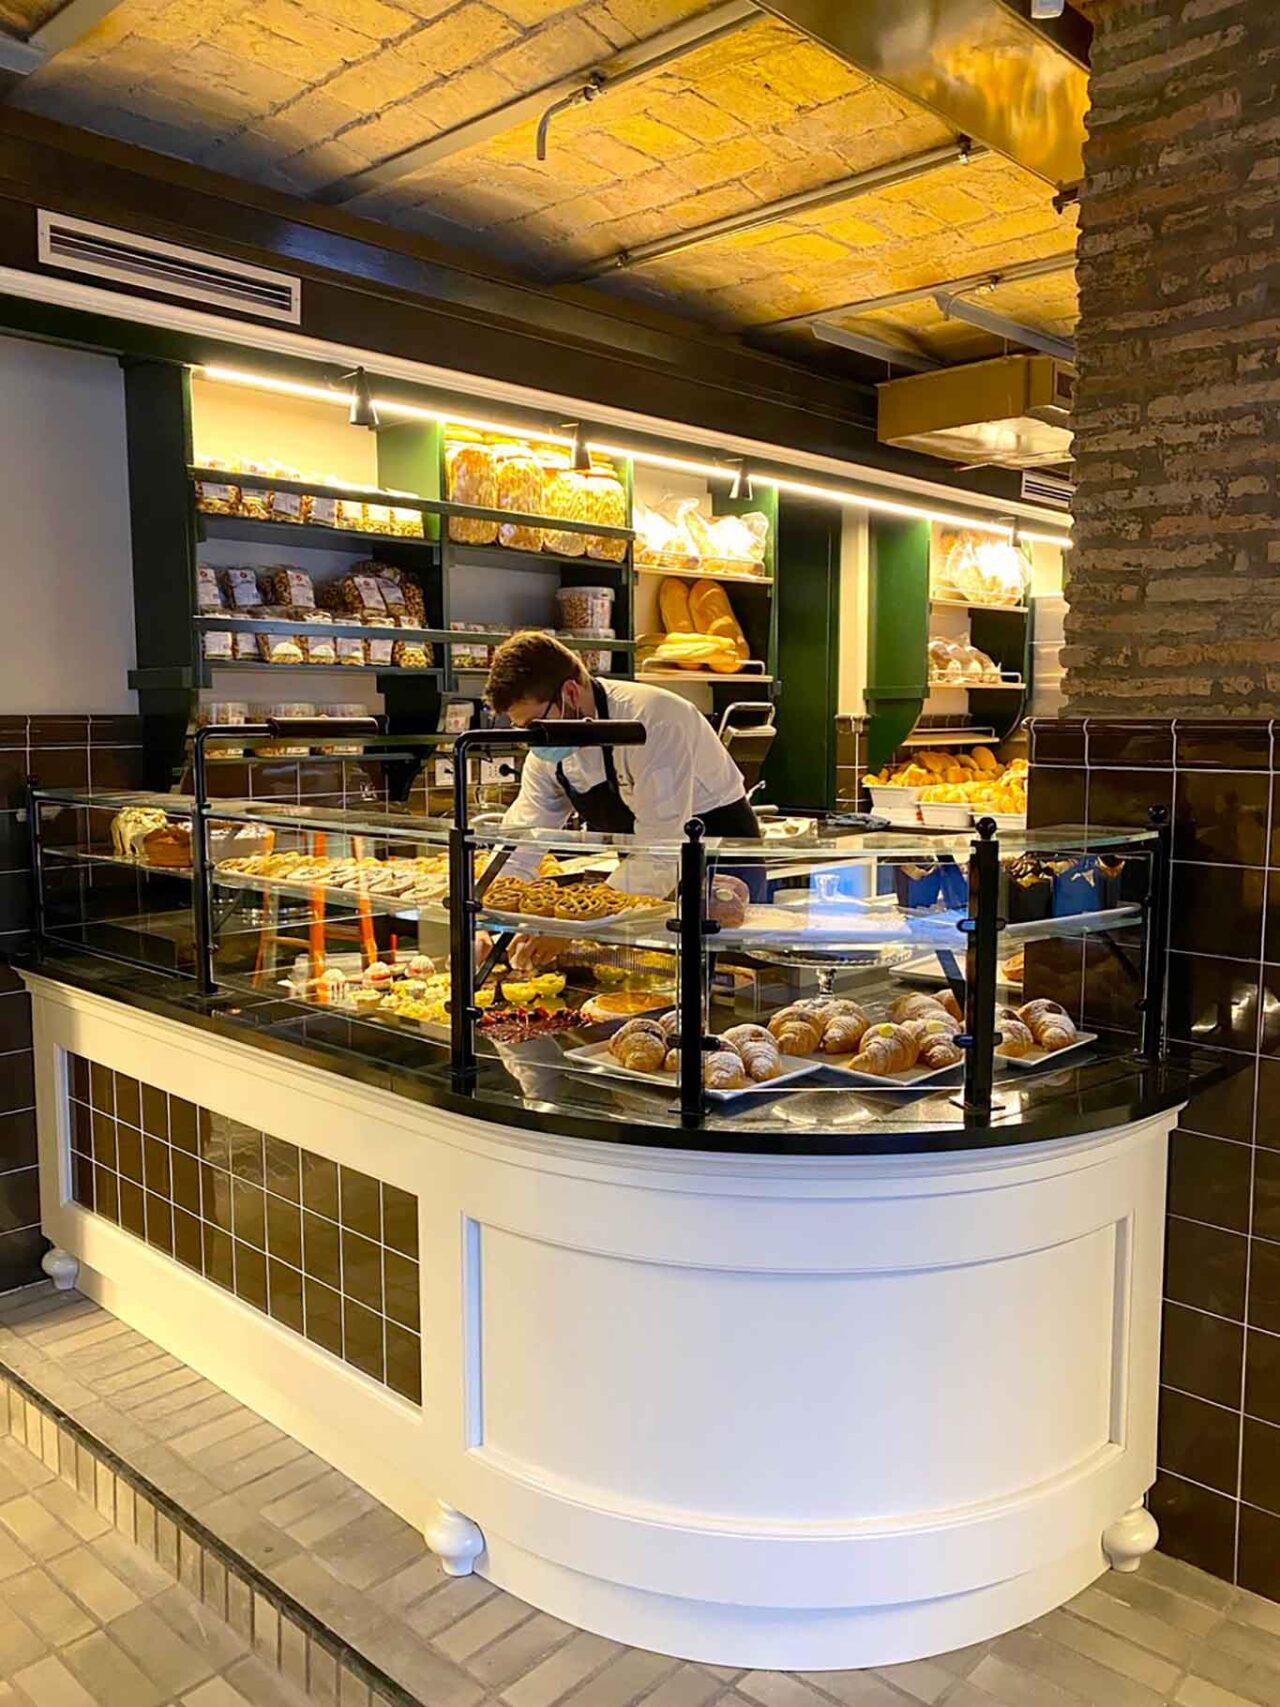 Ercoli Trastevere Roma bakery